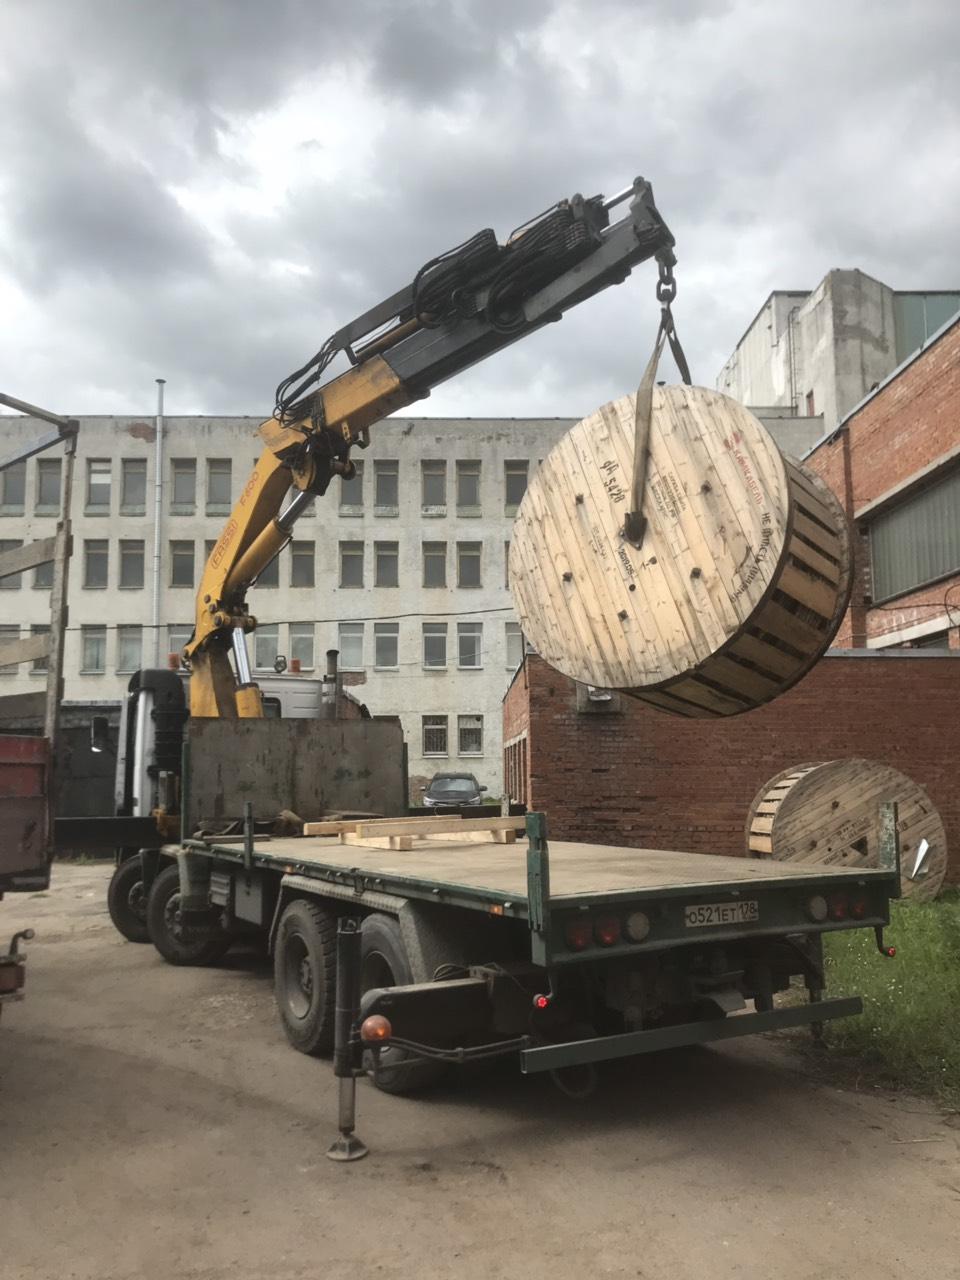 разгрузка манипулятором 5-тонных катушек